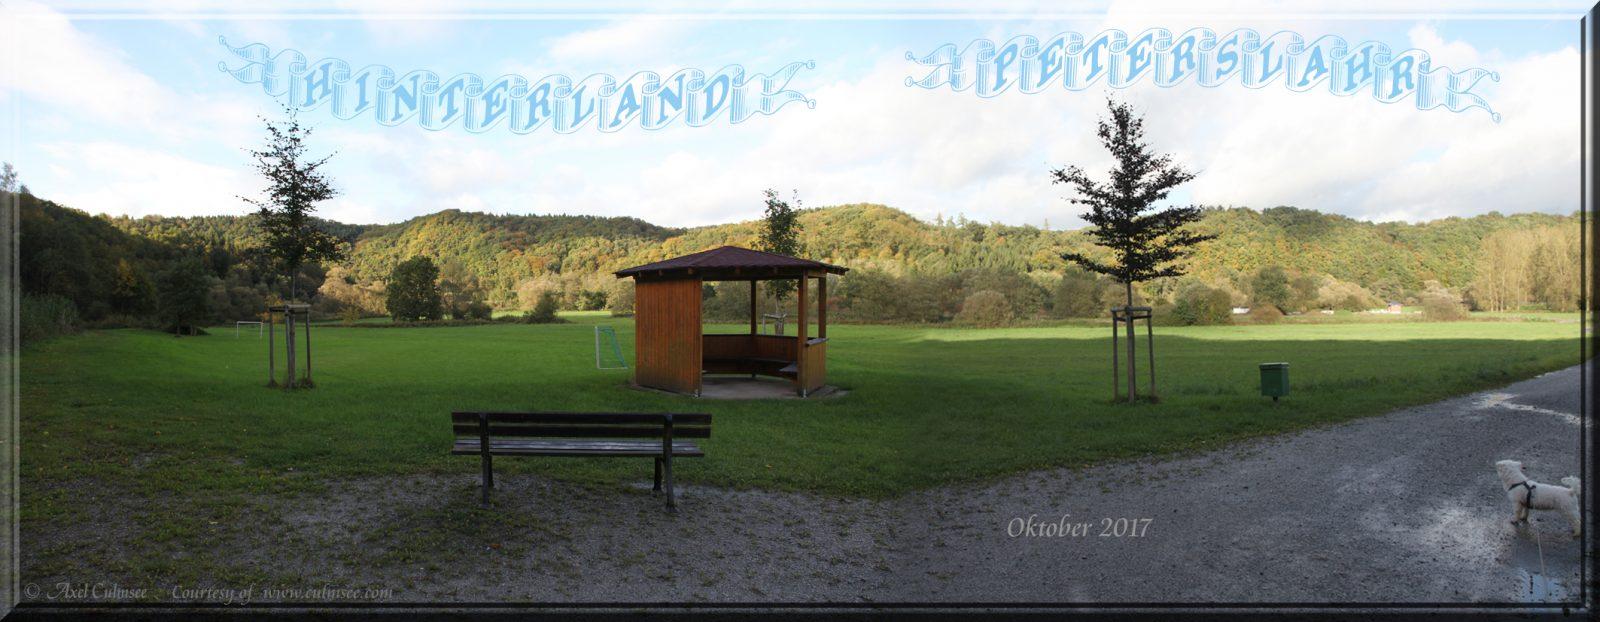 Peterslahr Hinterland-Panorama